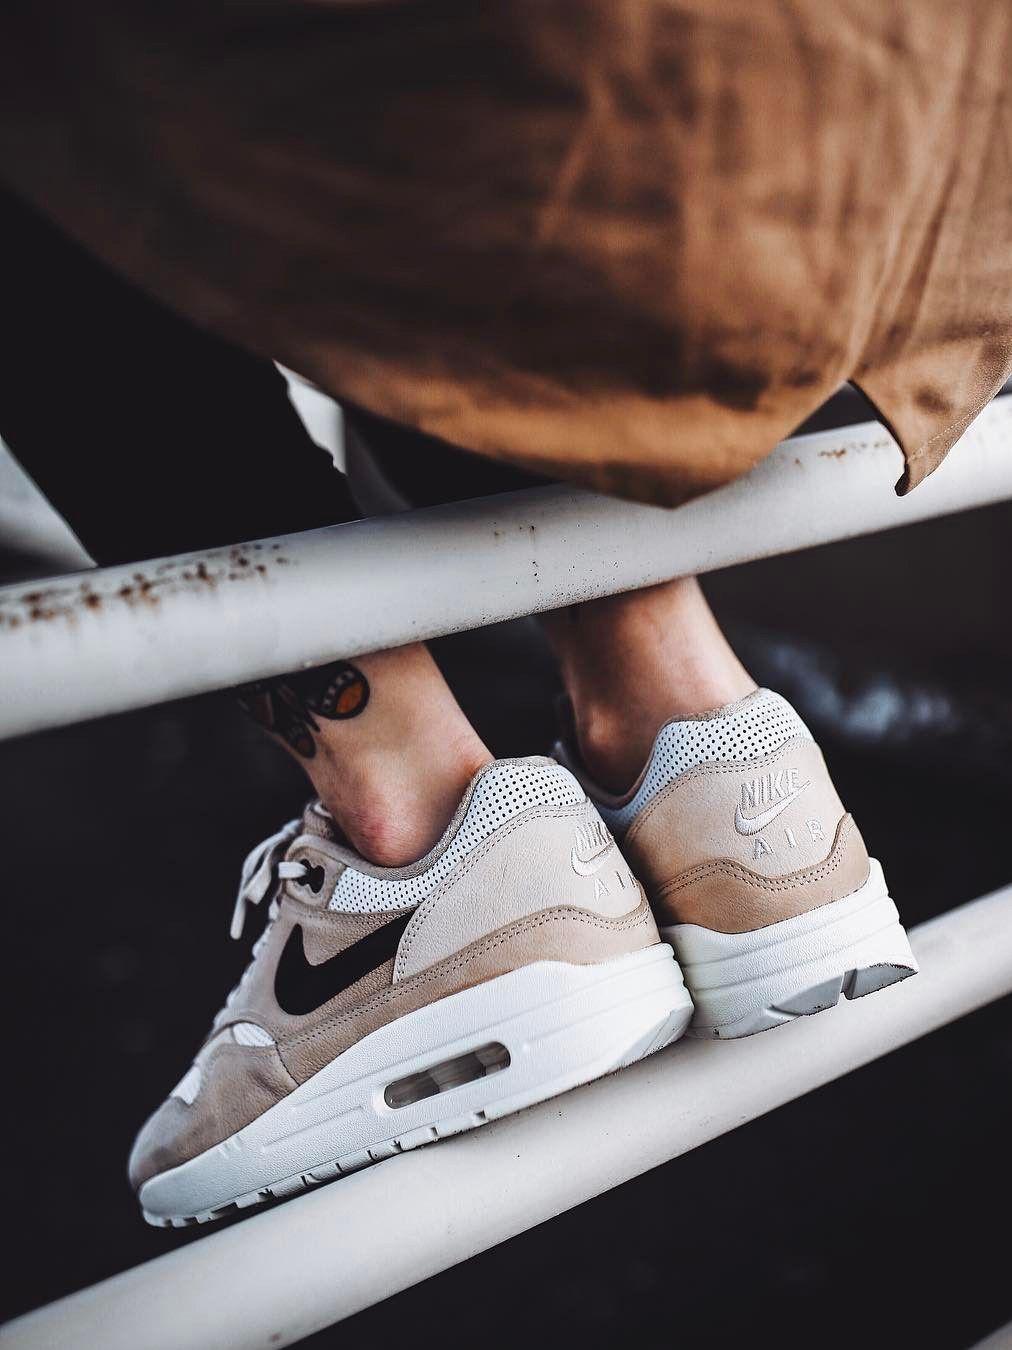 Tienda De Fábrica De Salida Nike Wmns Air Max 1 Premium